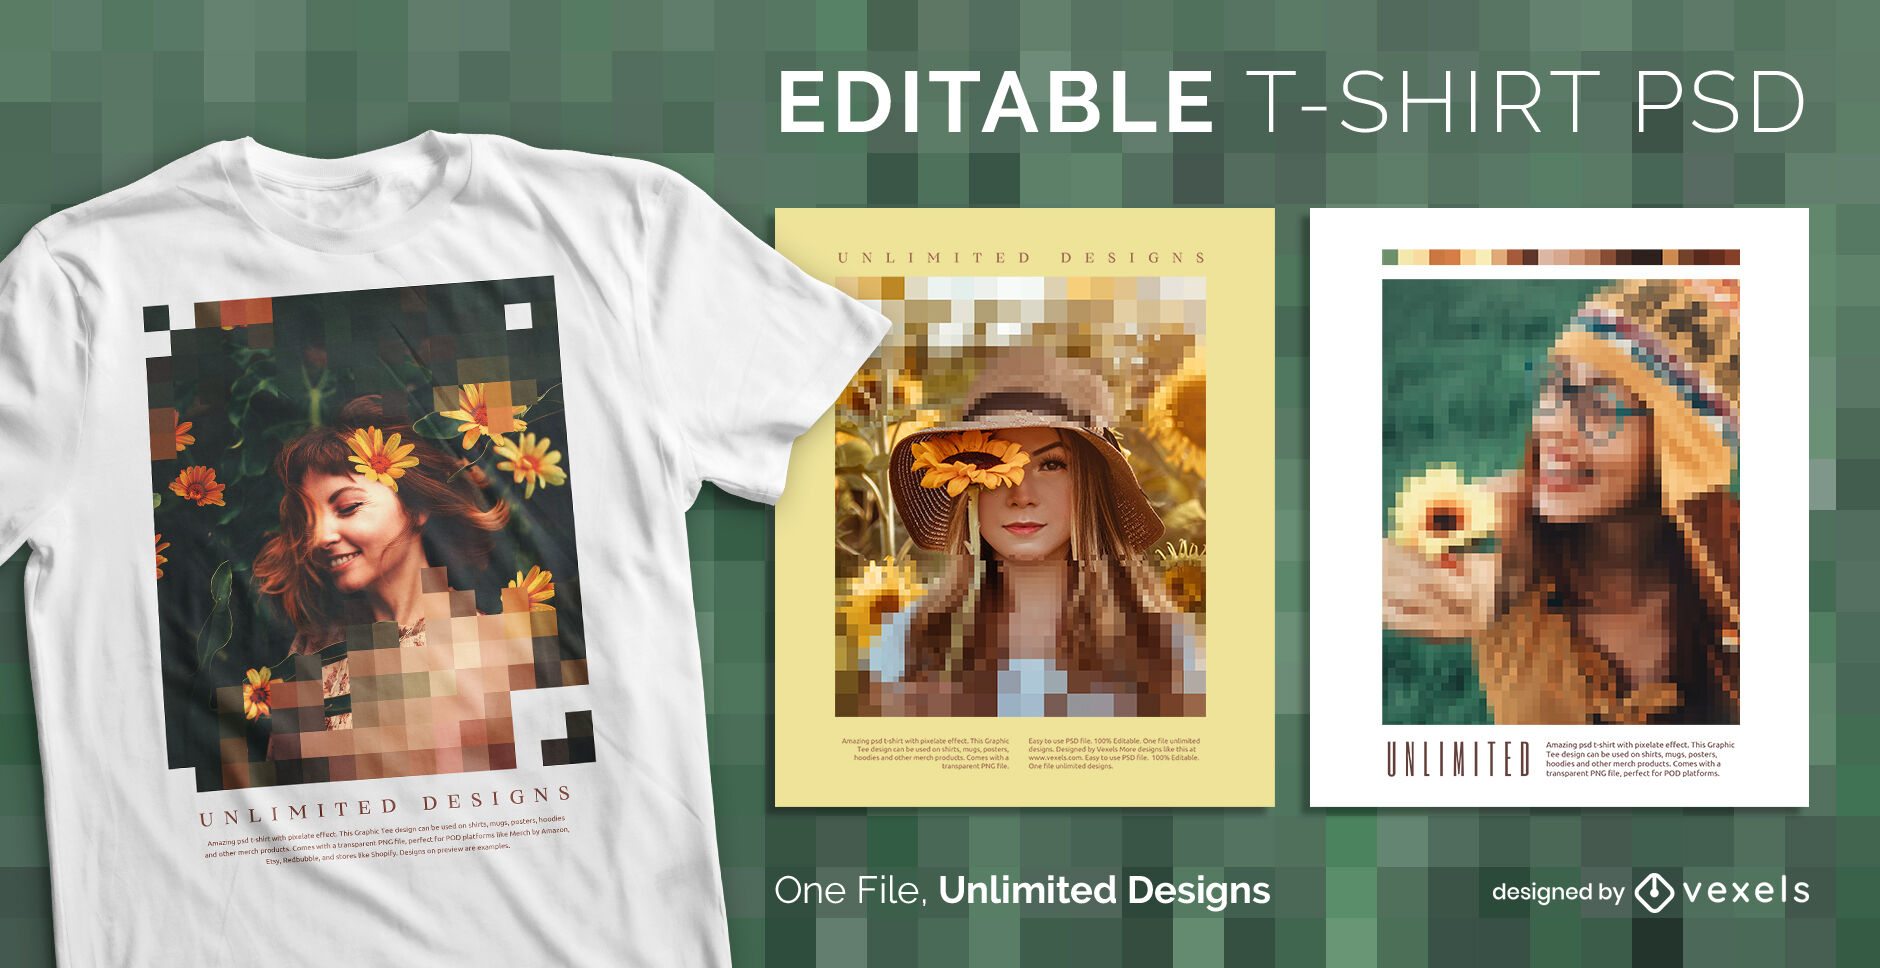 Pixels over image editable psd t-shirt